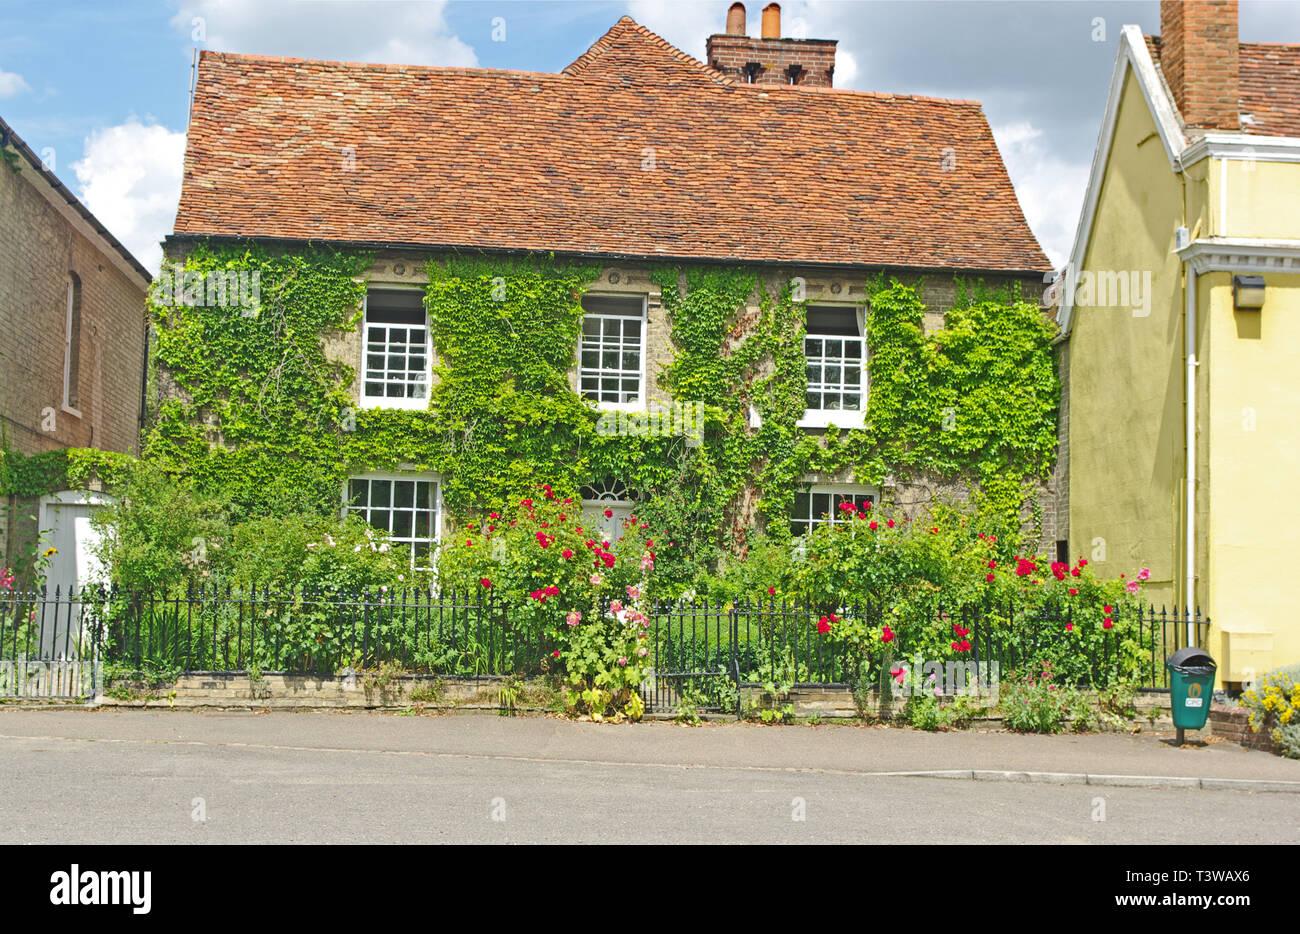 Cottage, Cavendish, Suffolk - Stock Image